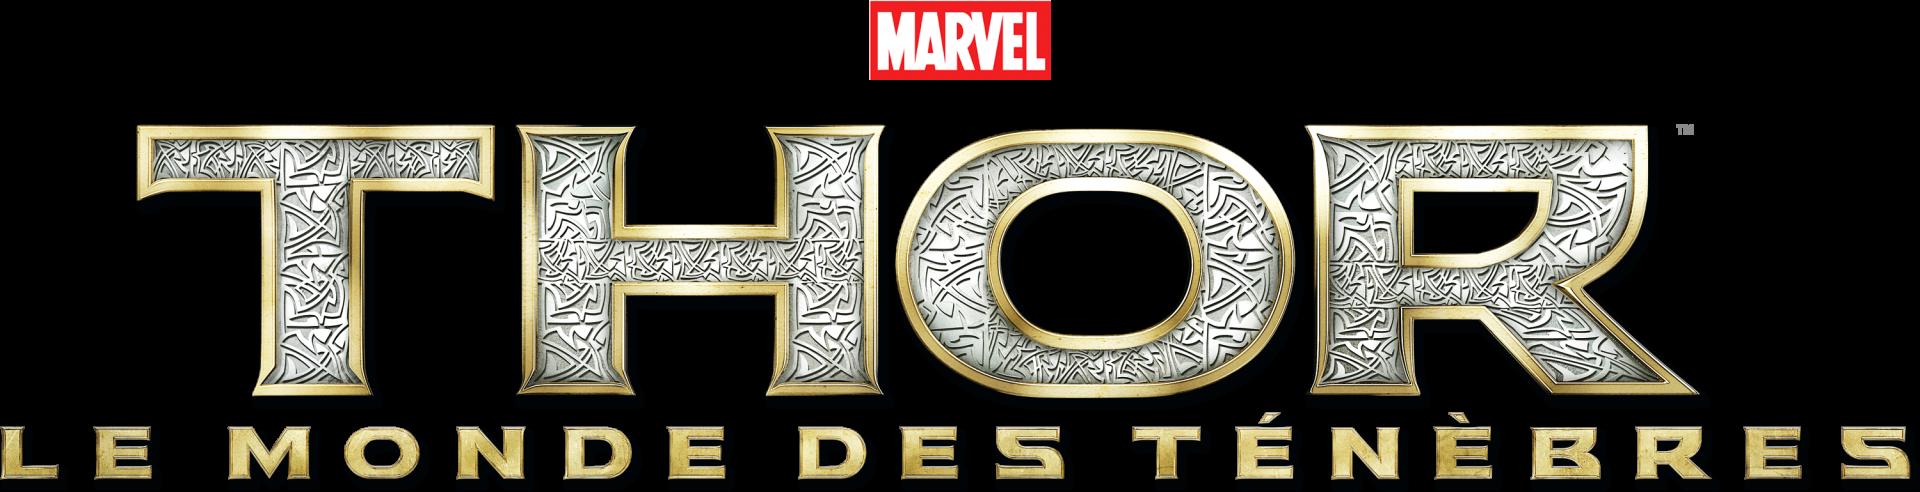 Thor2logo